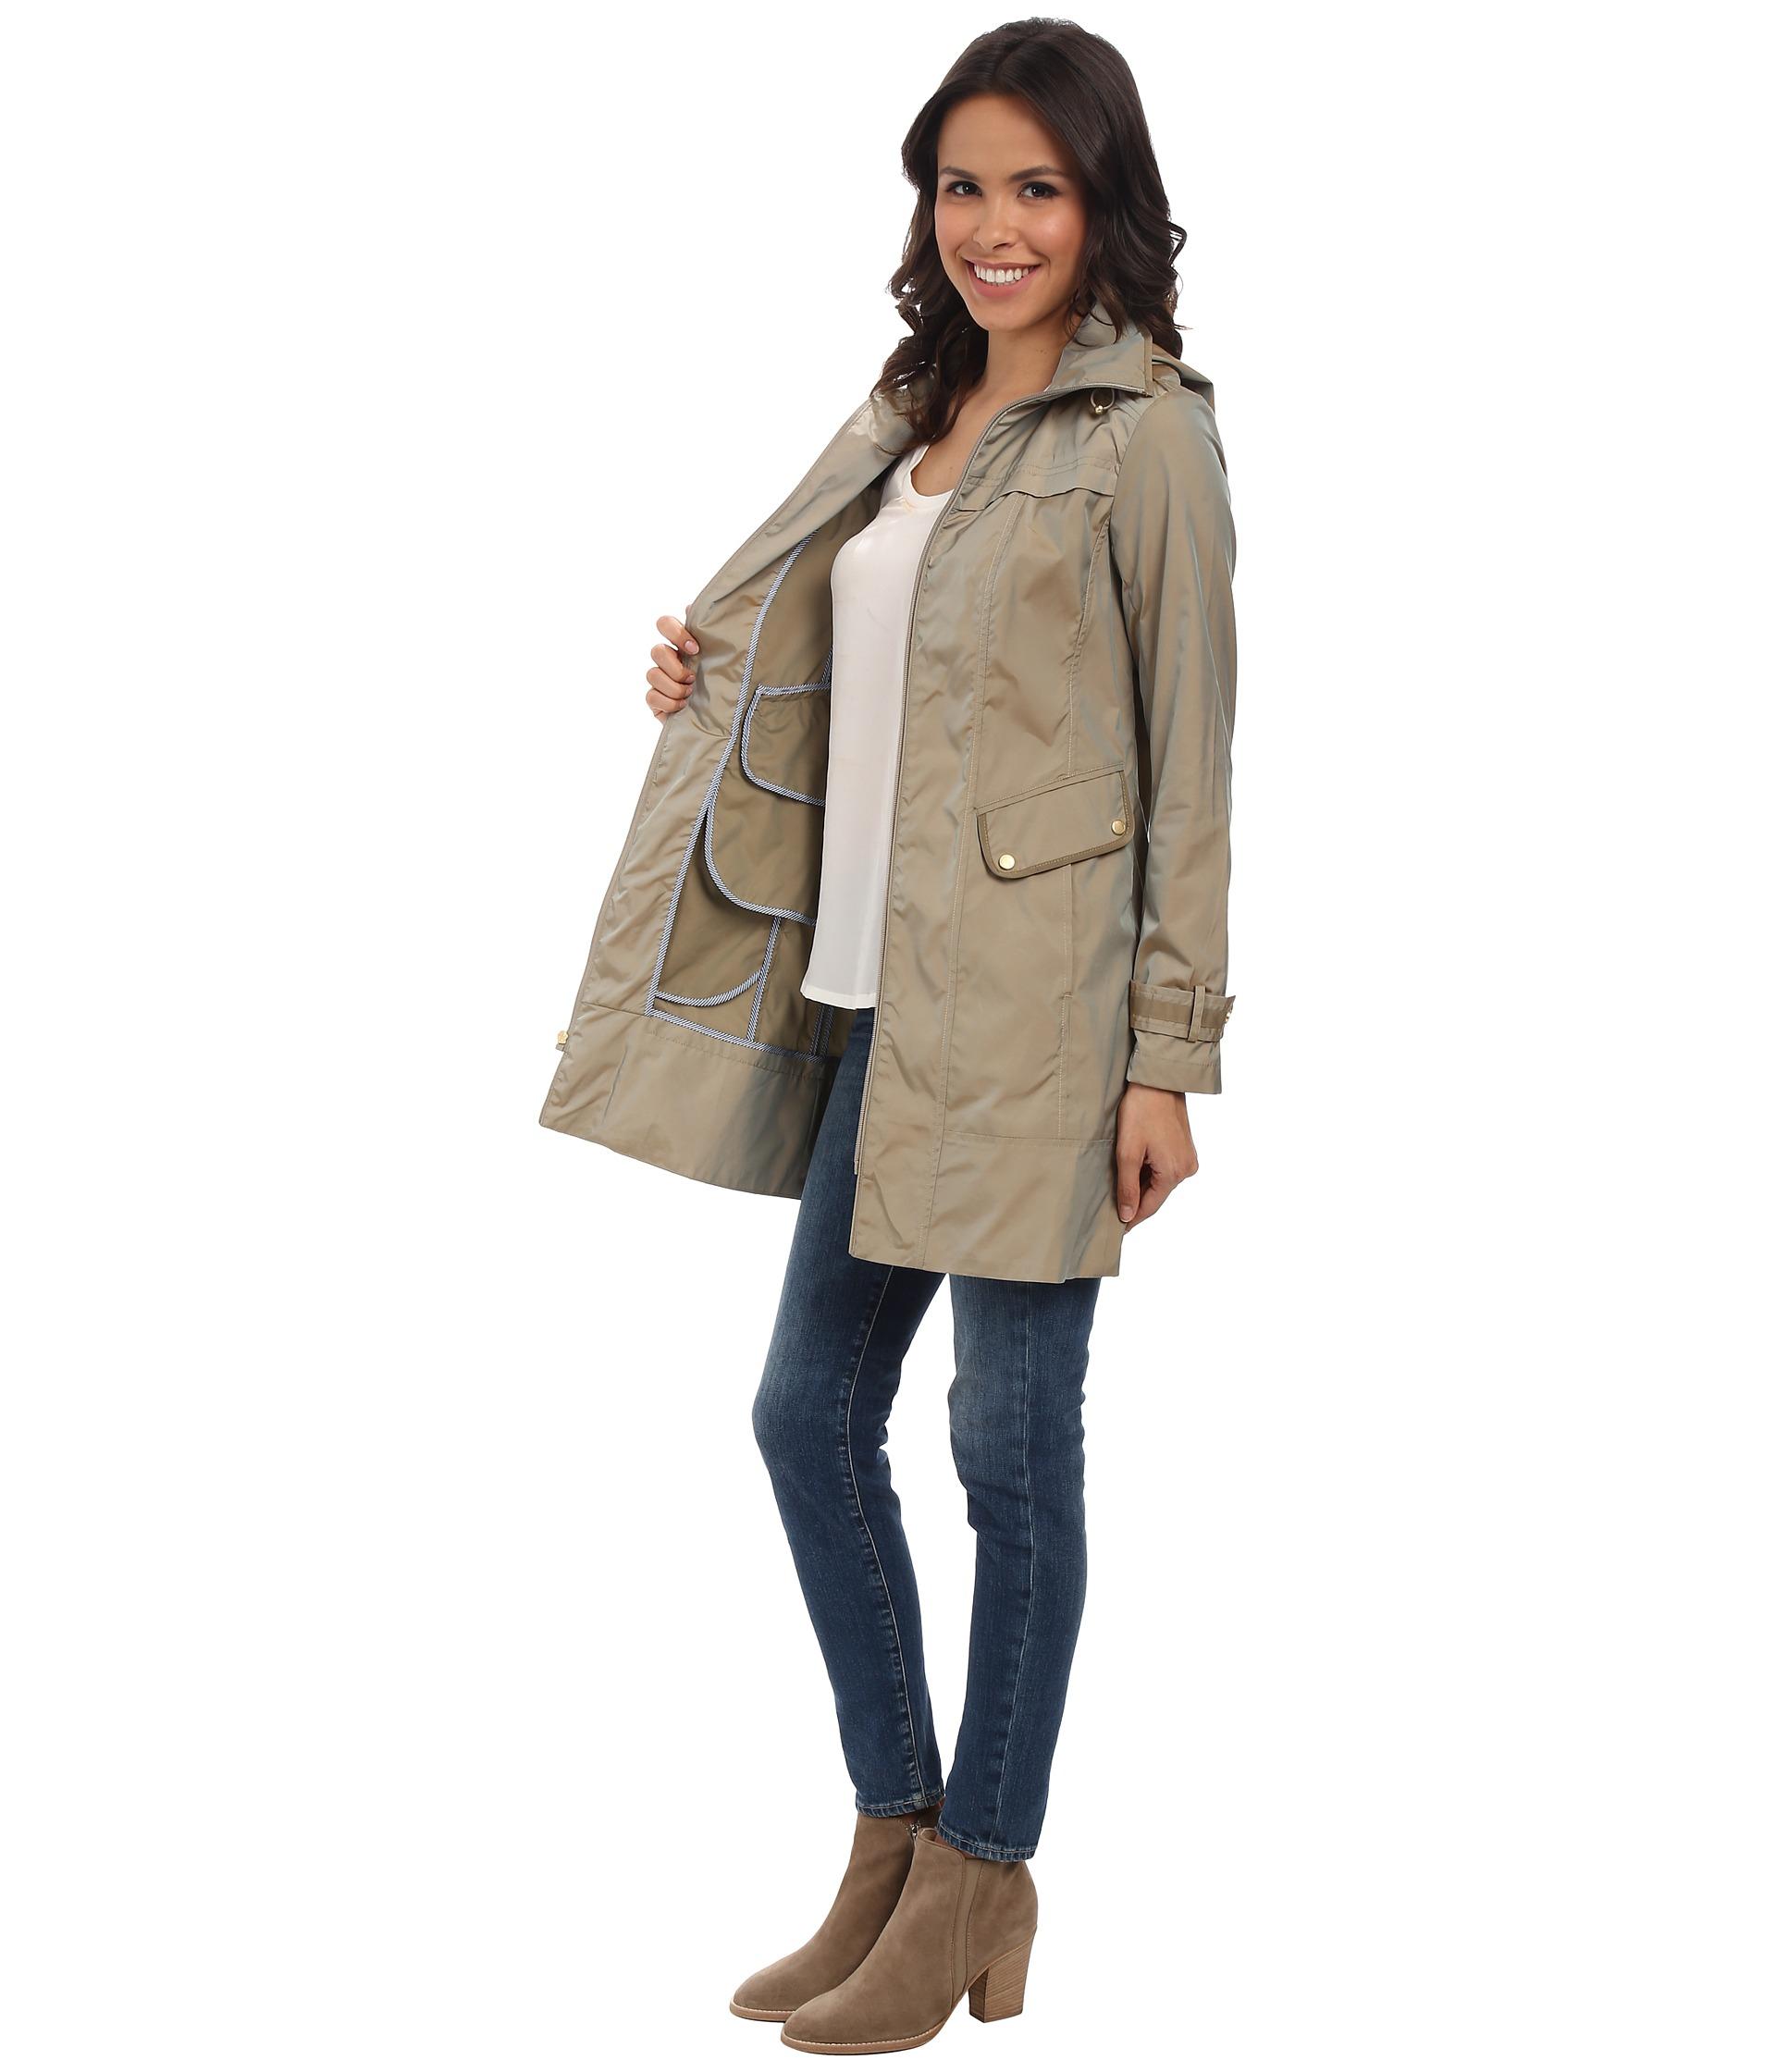 Womens Black Zip Raincoat With Hood